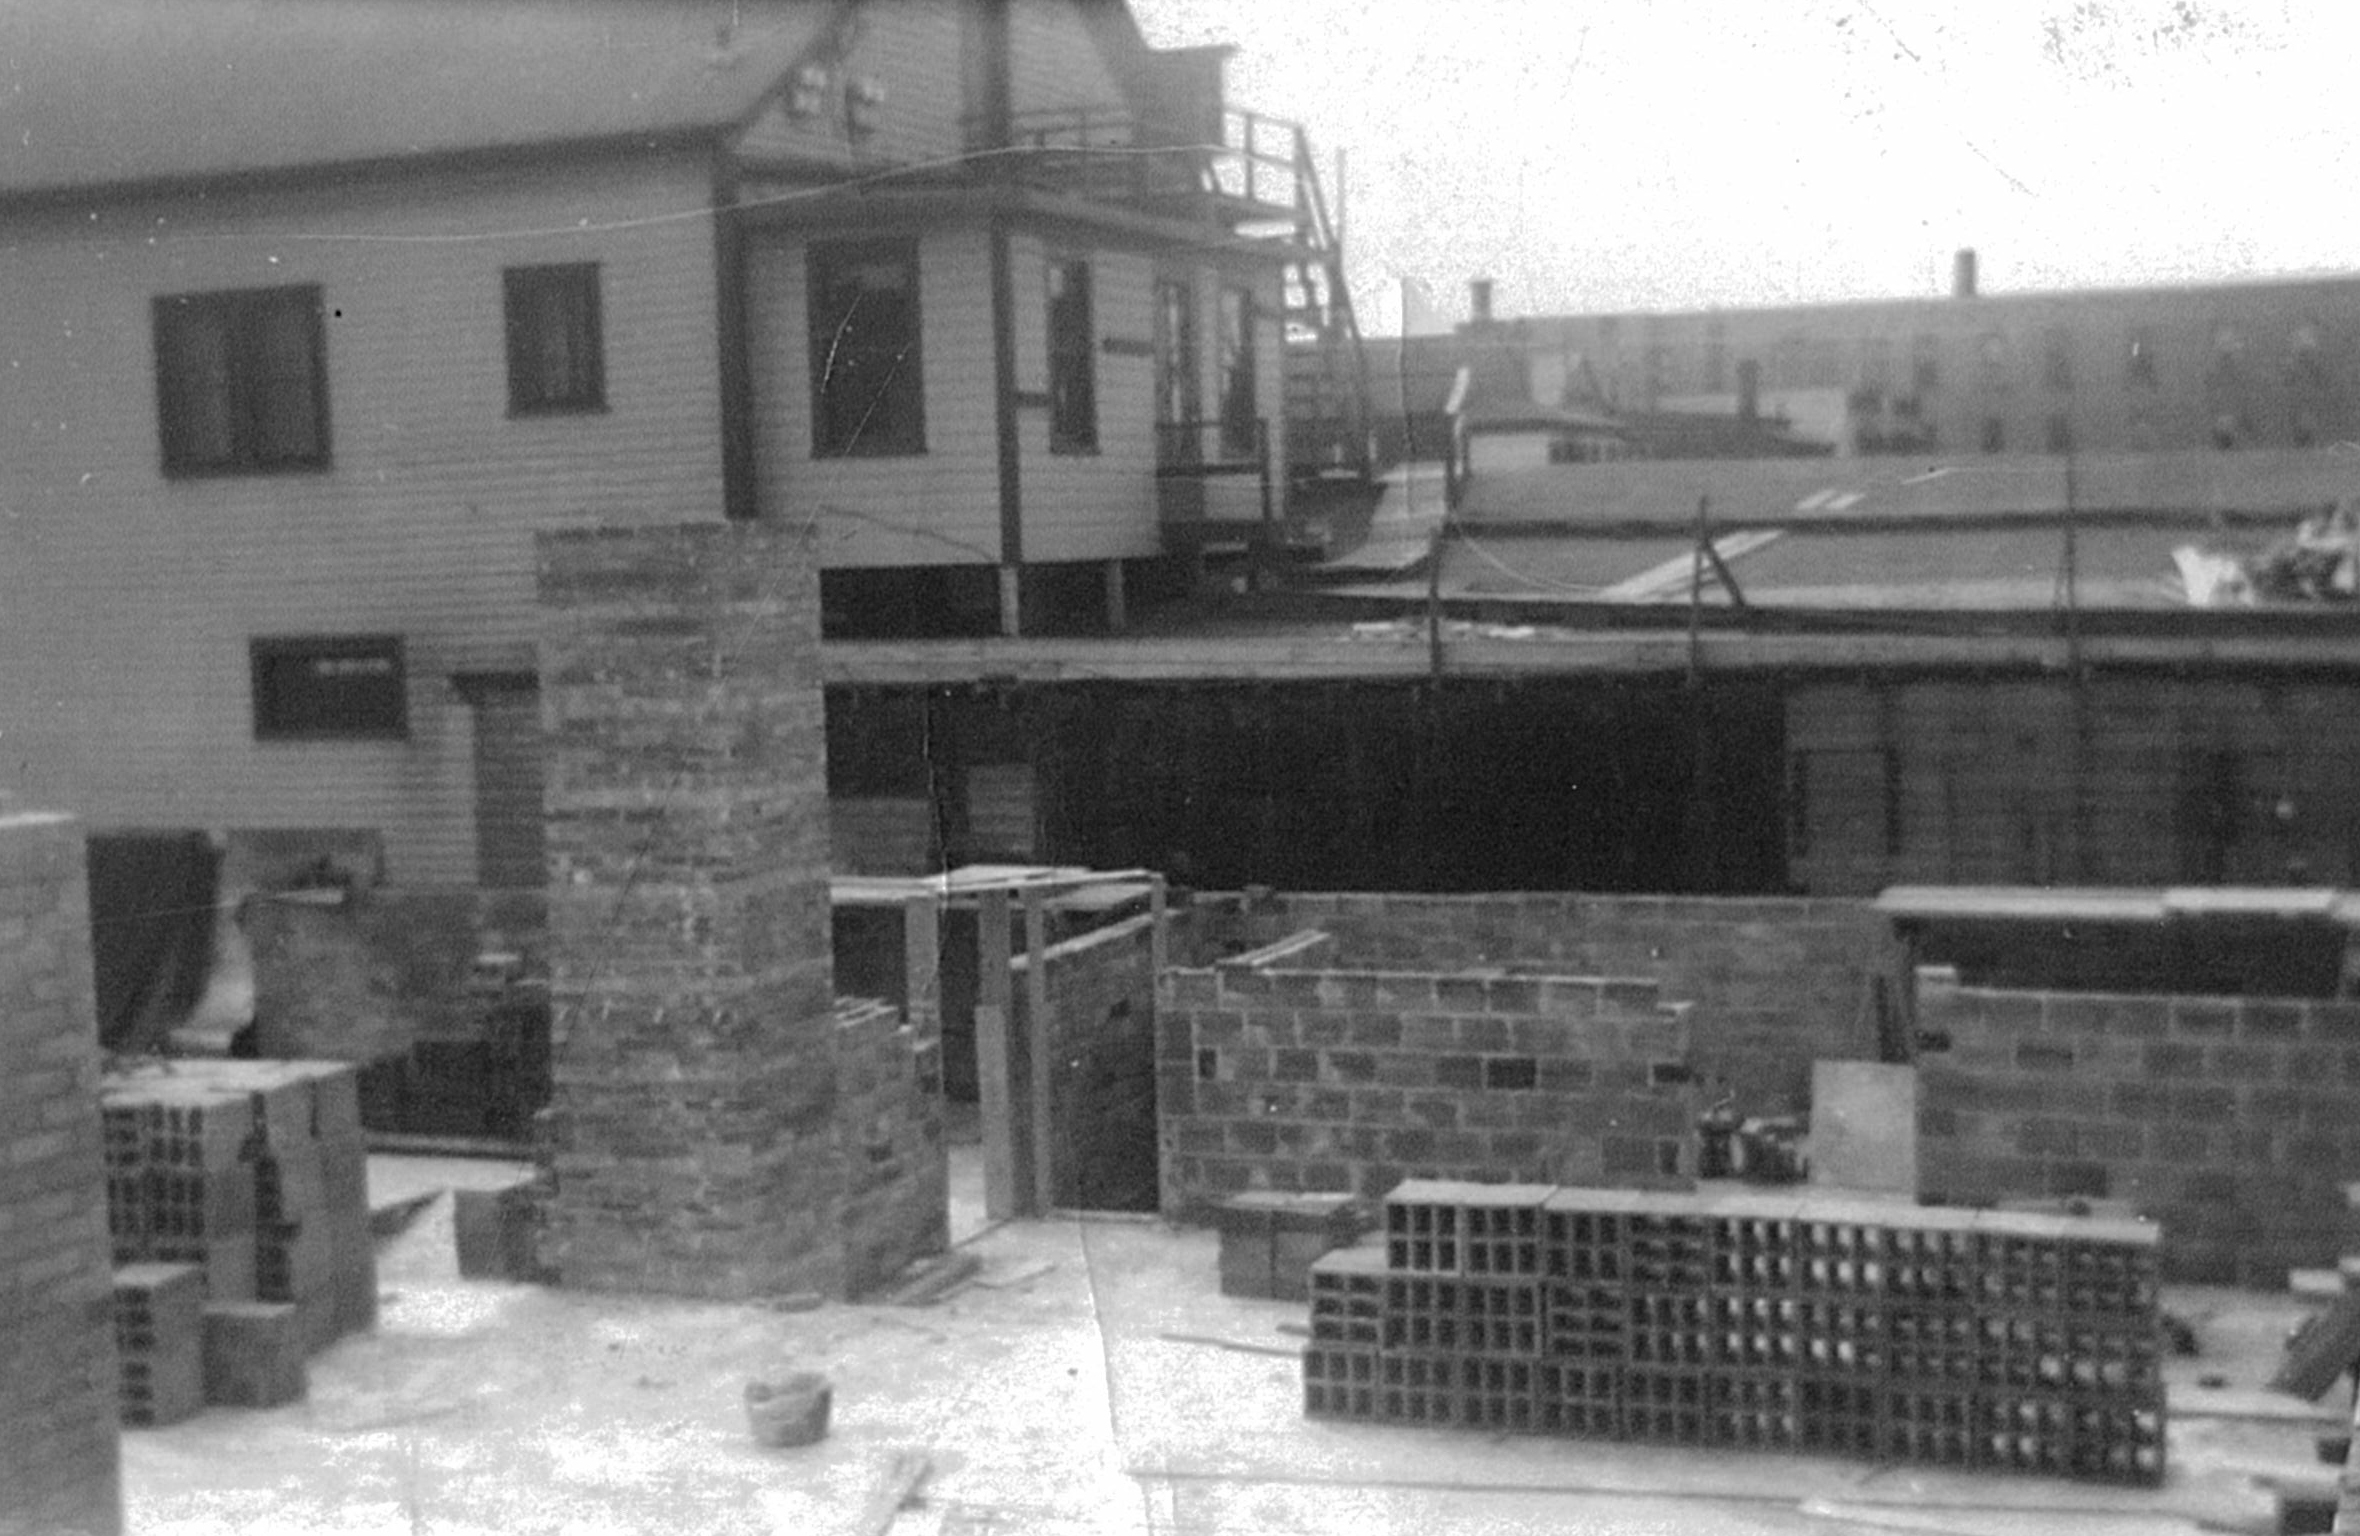 Construction1939 - 2